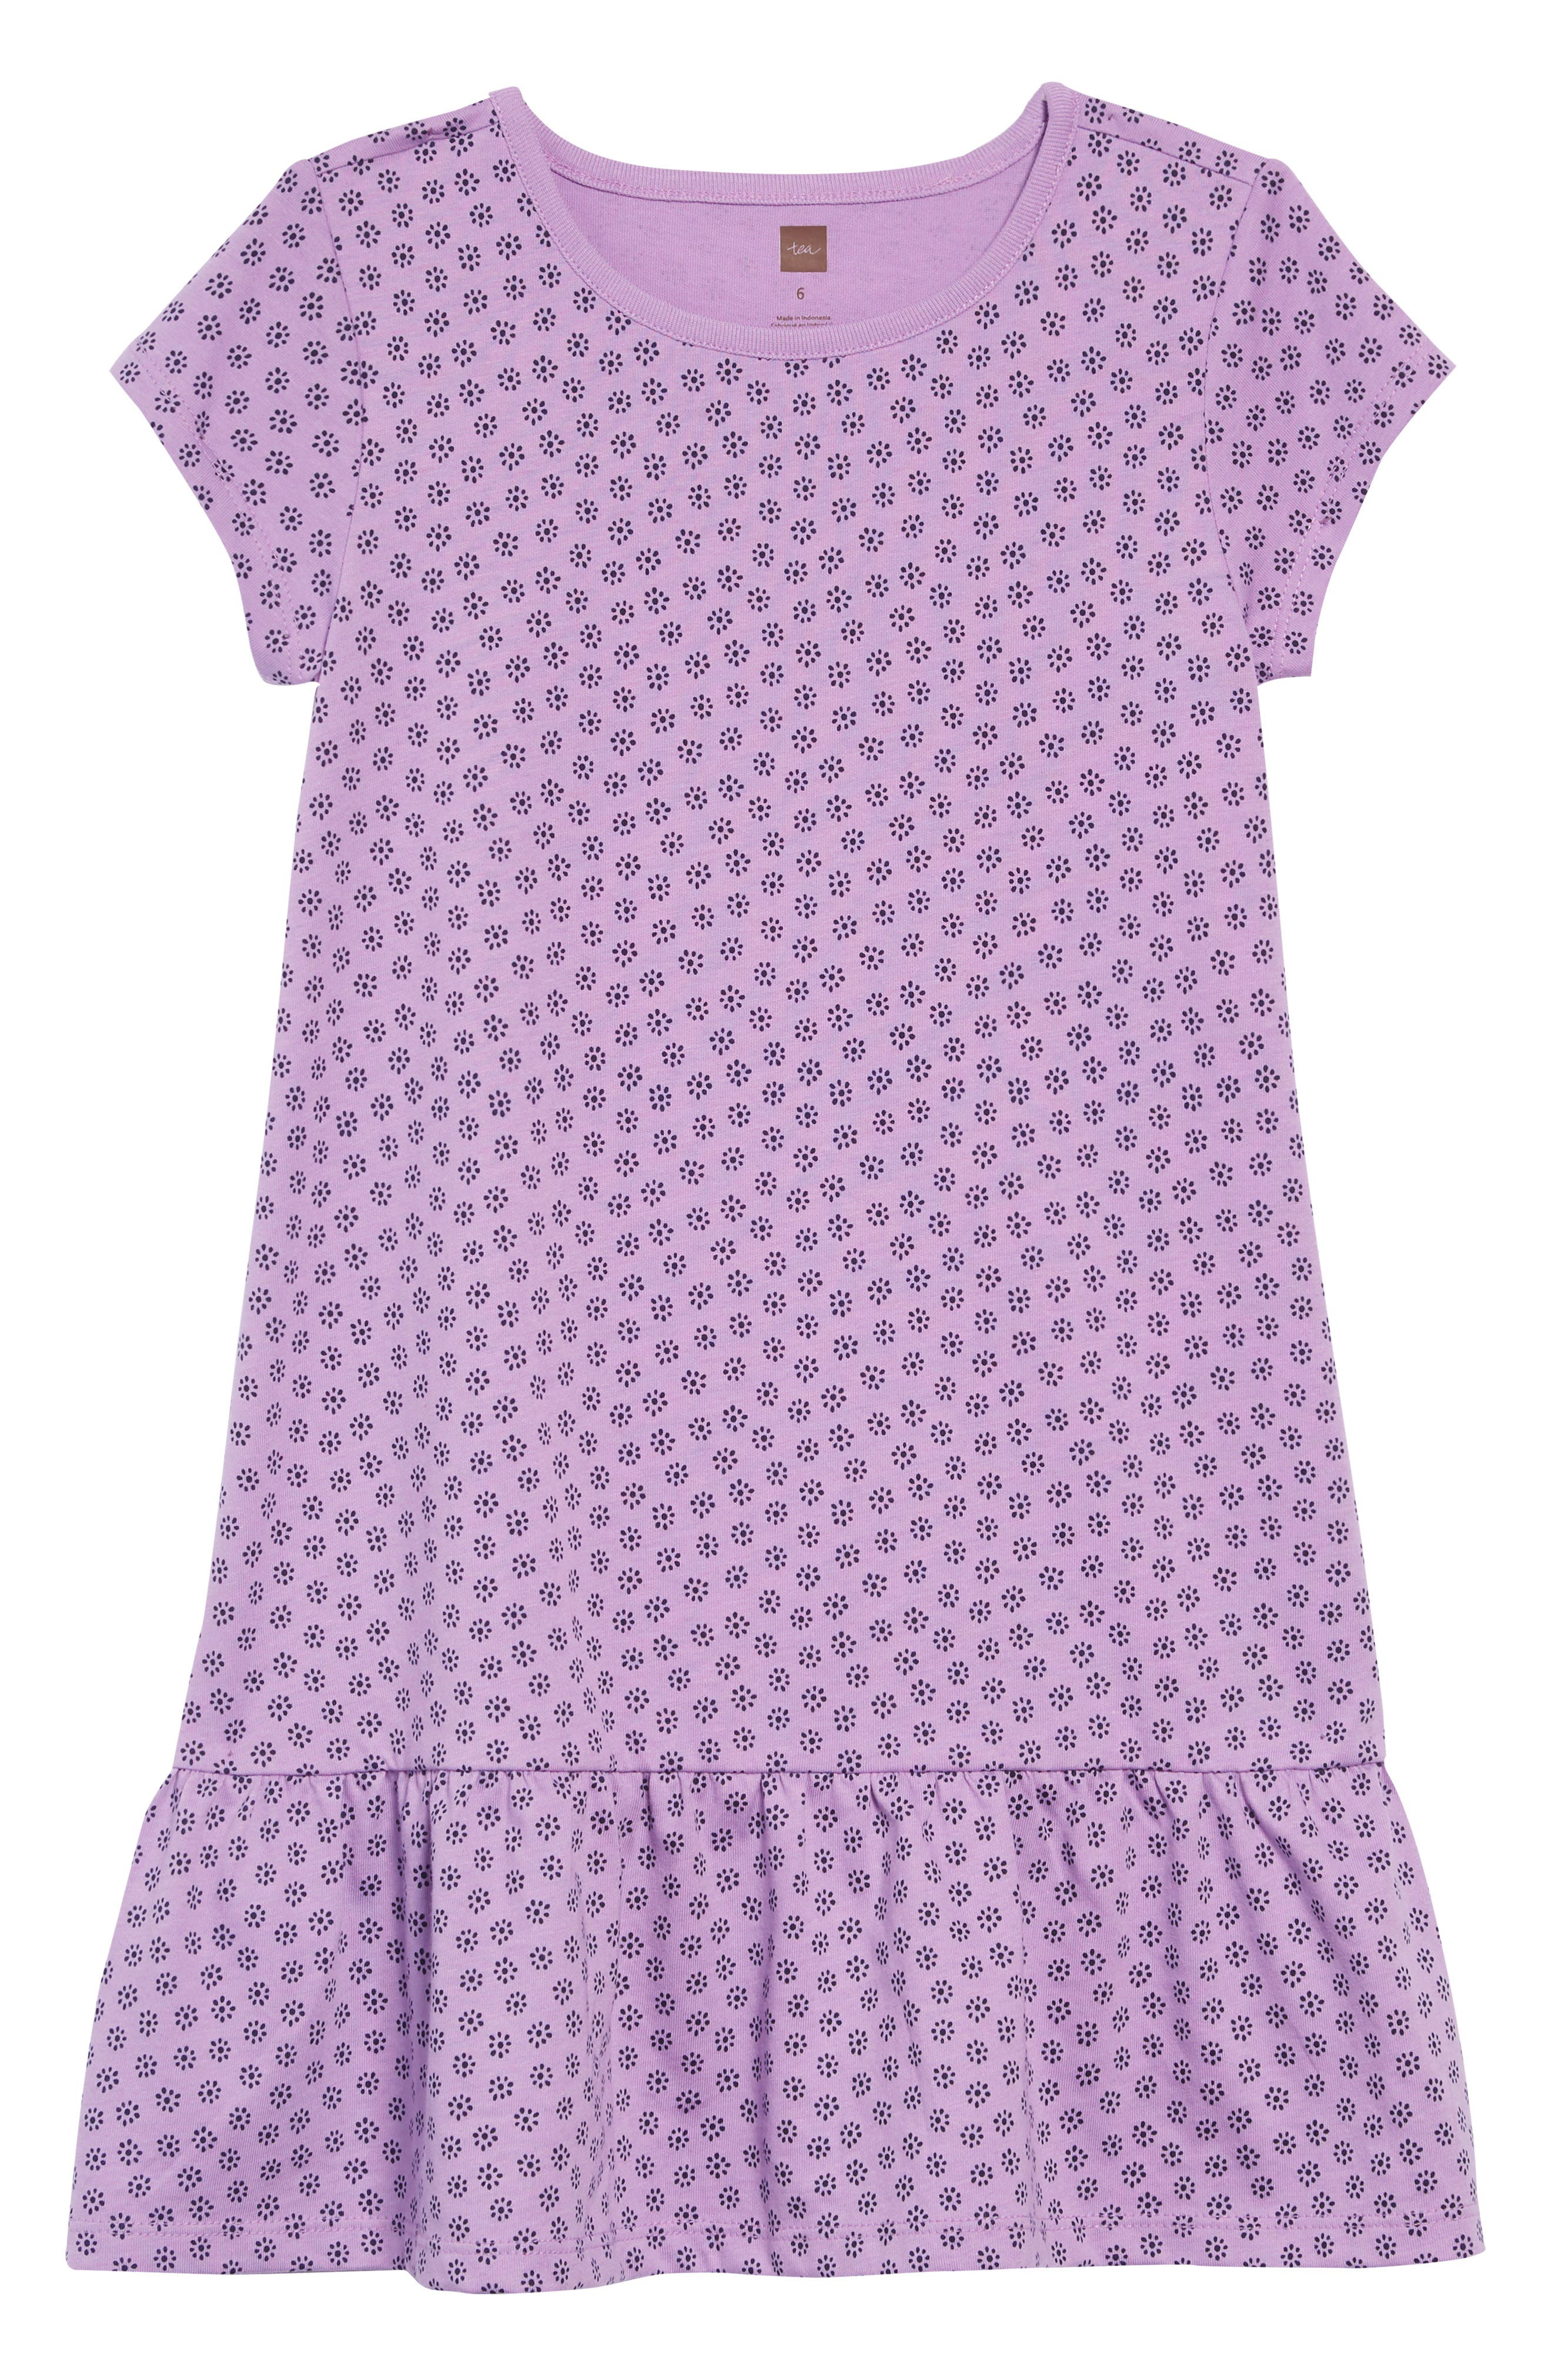 Print Ruffle Dress,                             Main thumbnail 1, color,                             POTTERY FLORAL